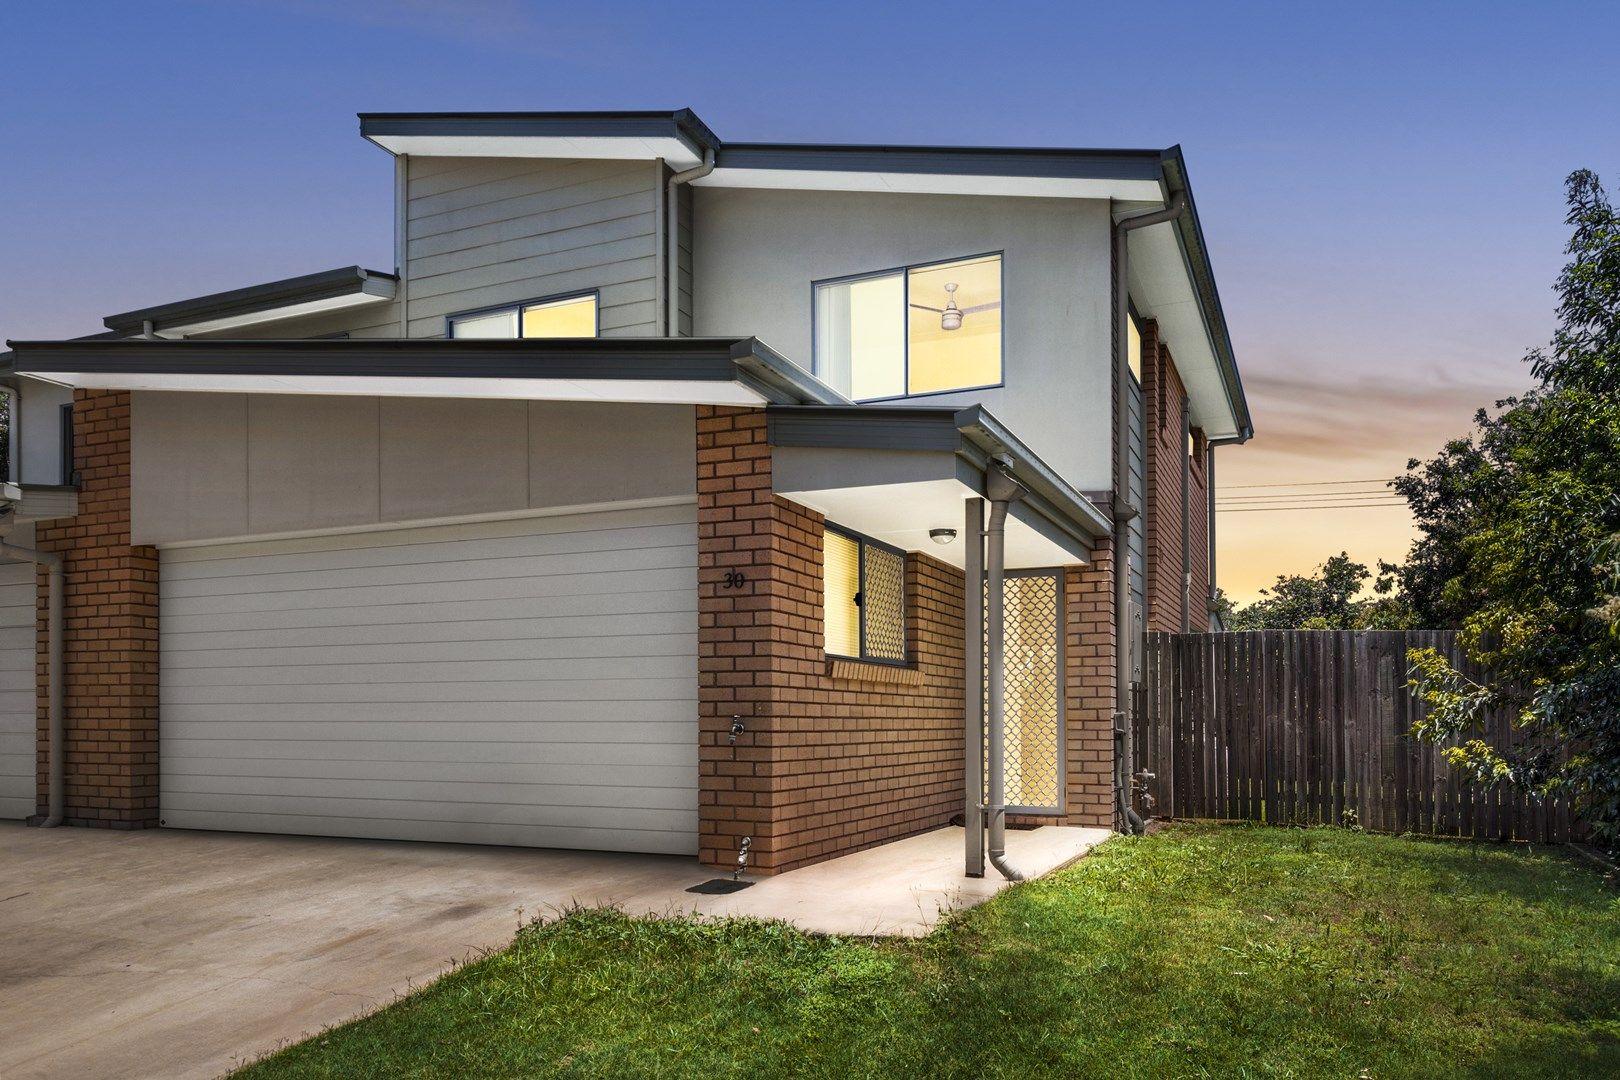 30/1 Grandly Street, Doolandella QLD 4077, Image 0